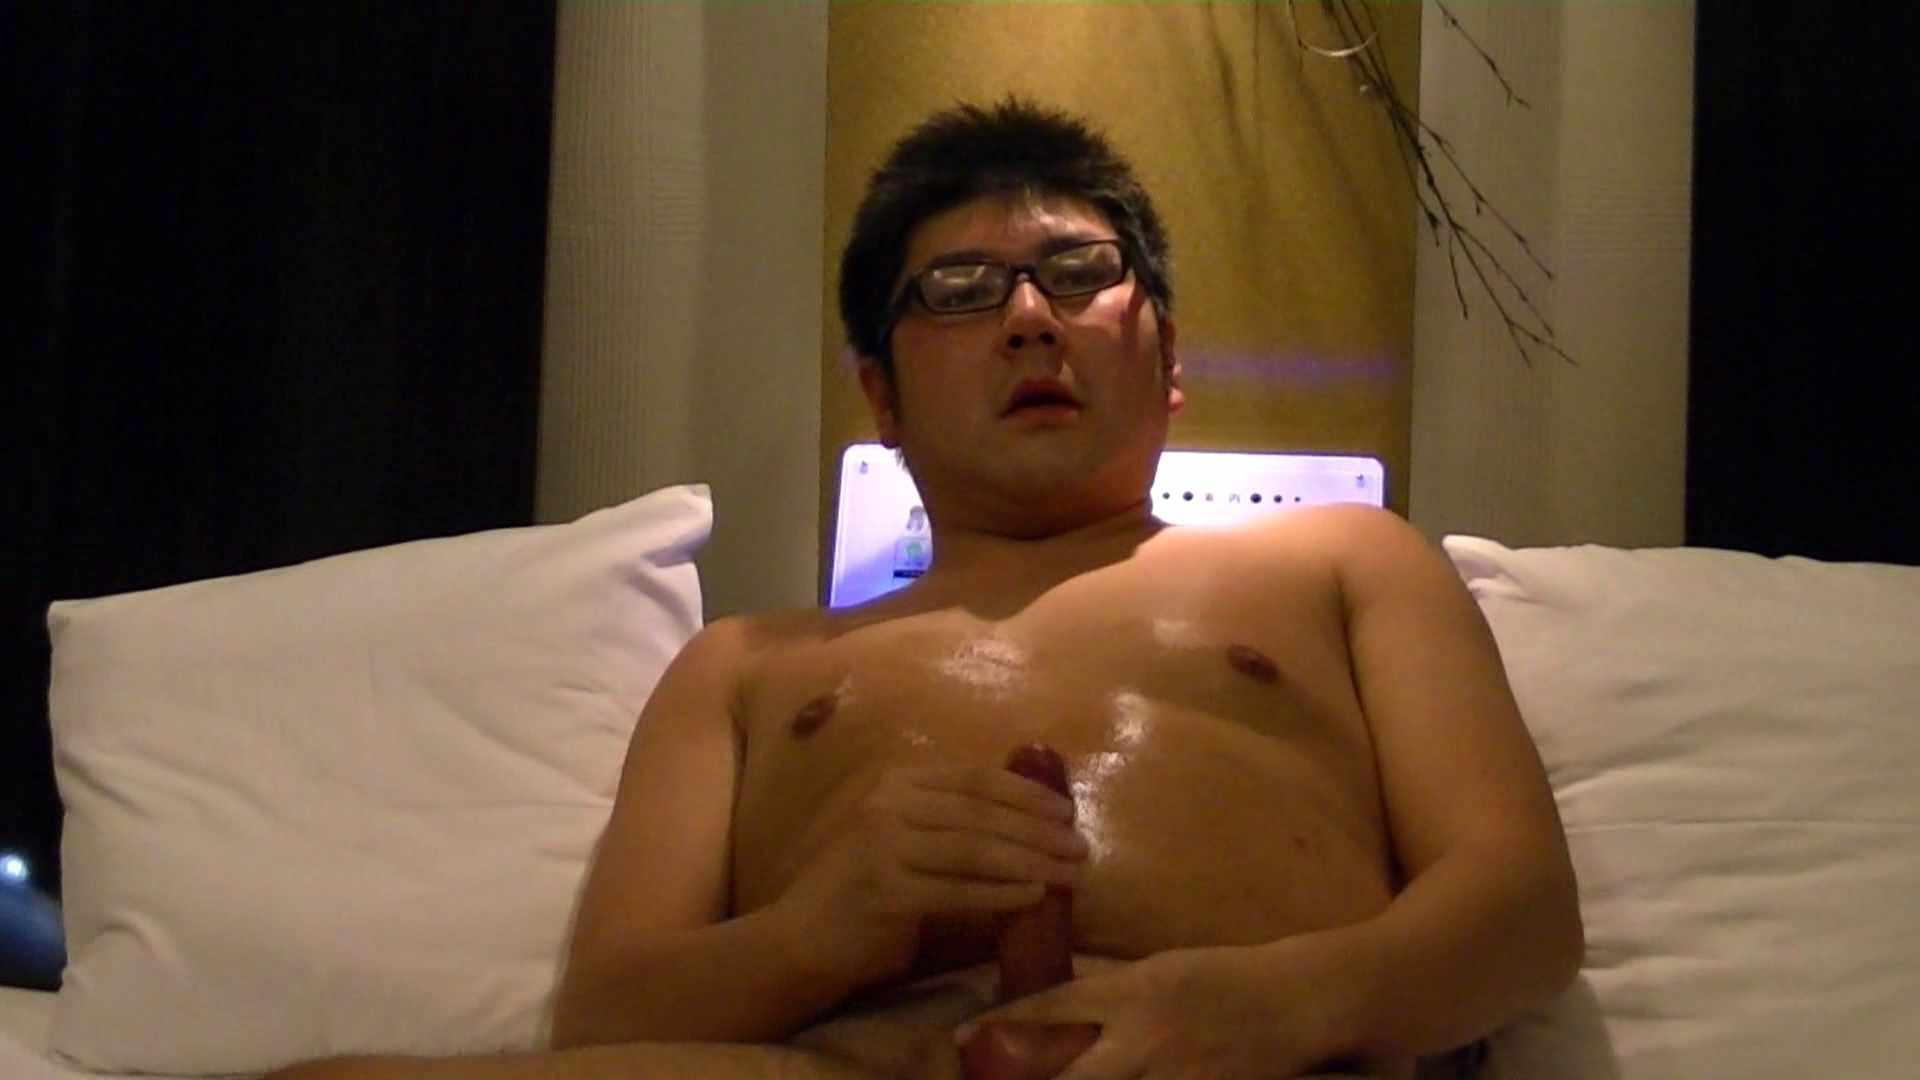 Mr.オナックスさん投稿!HD 貴方のオナニー三万円で撮影させてください。VOL.03 後編 オナニー編 ゲイAV画像 106枚 44